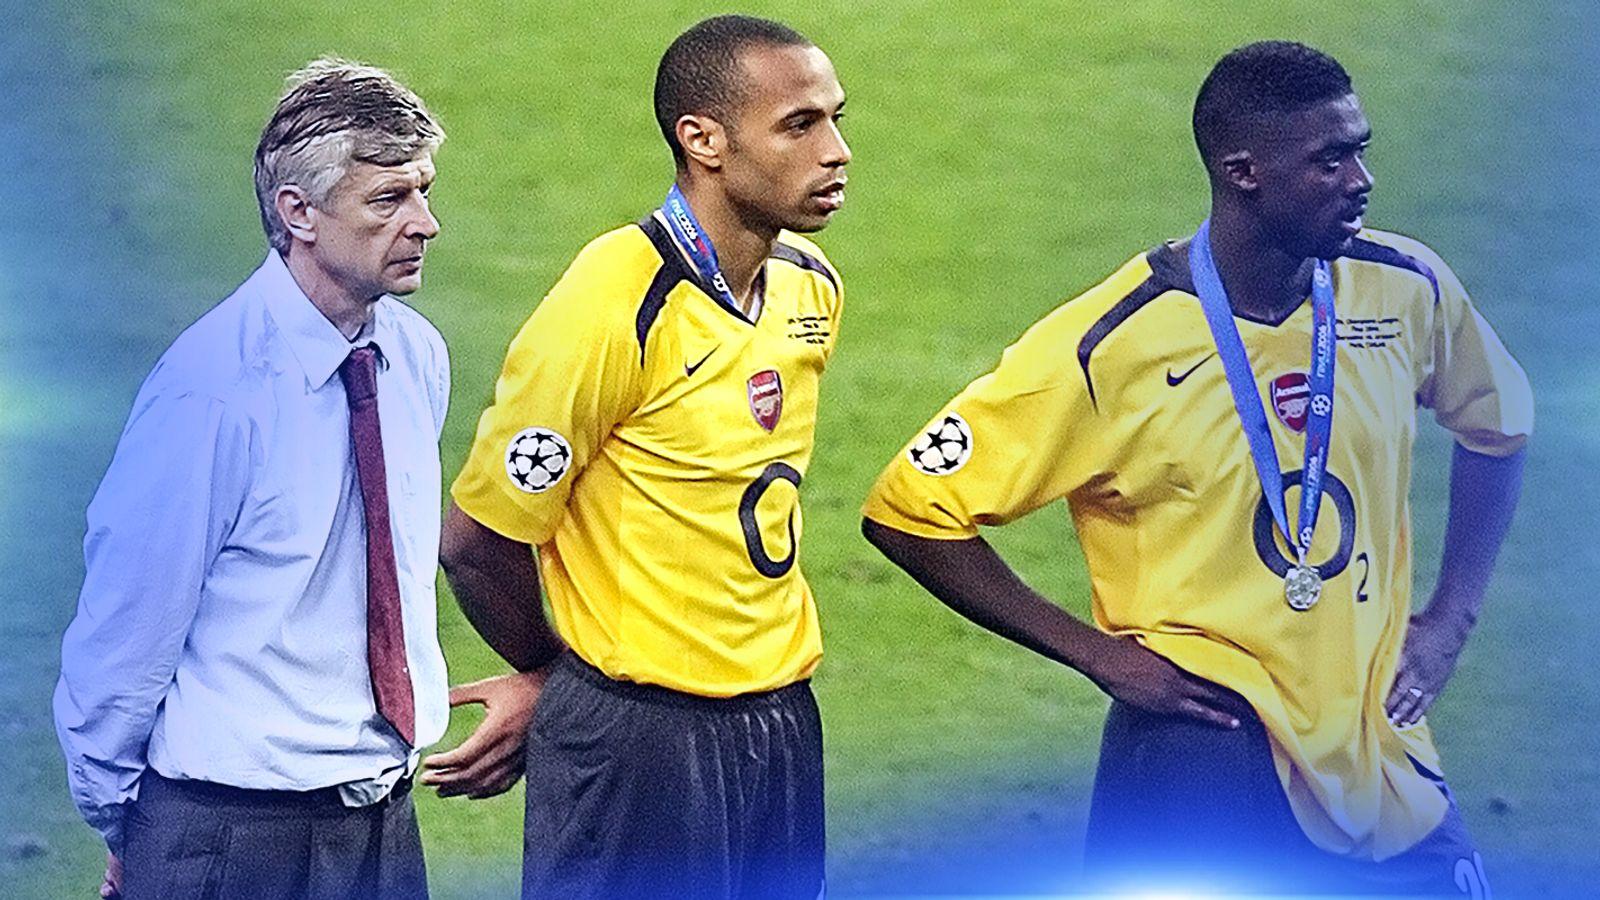 Arsene Wenger's Arsenal still showing scars from 2006